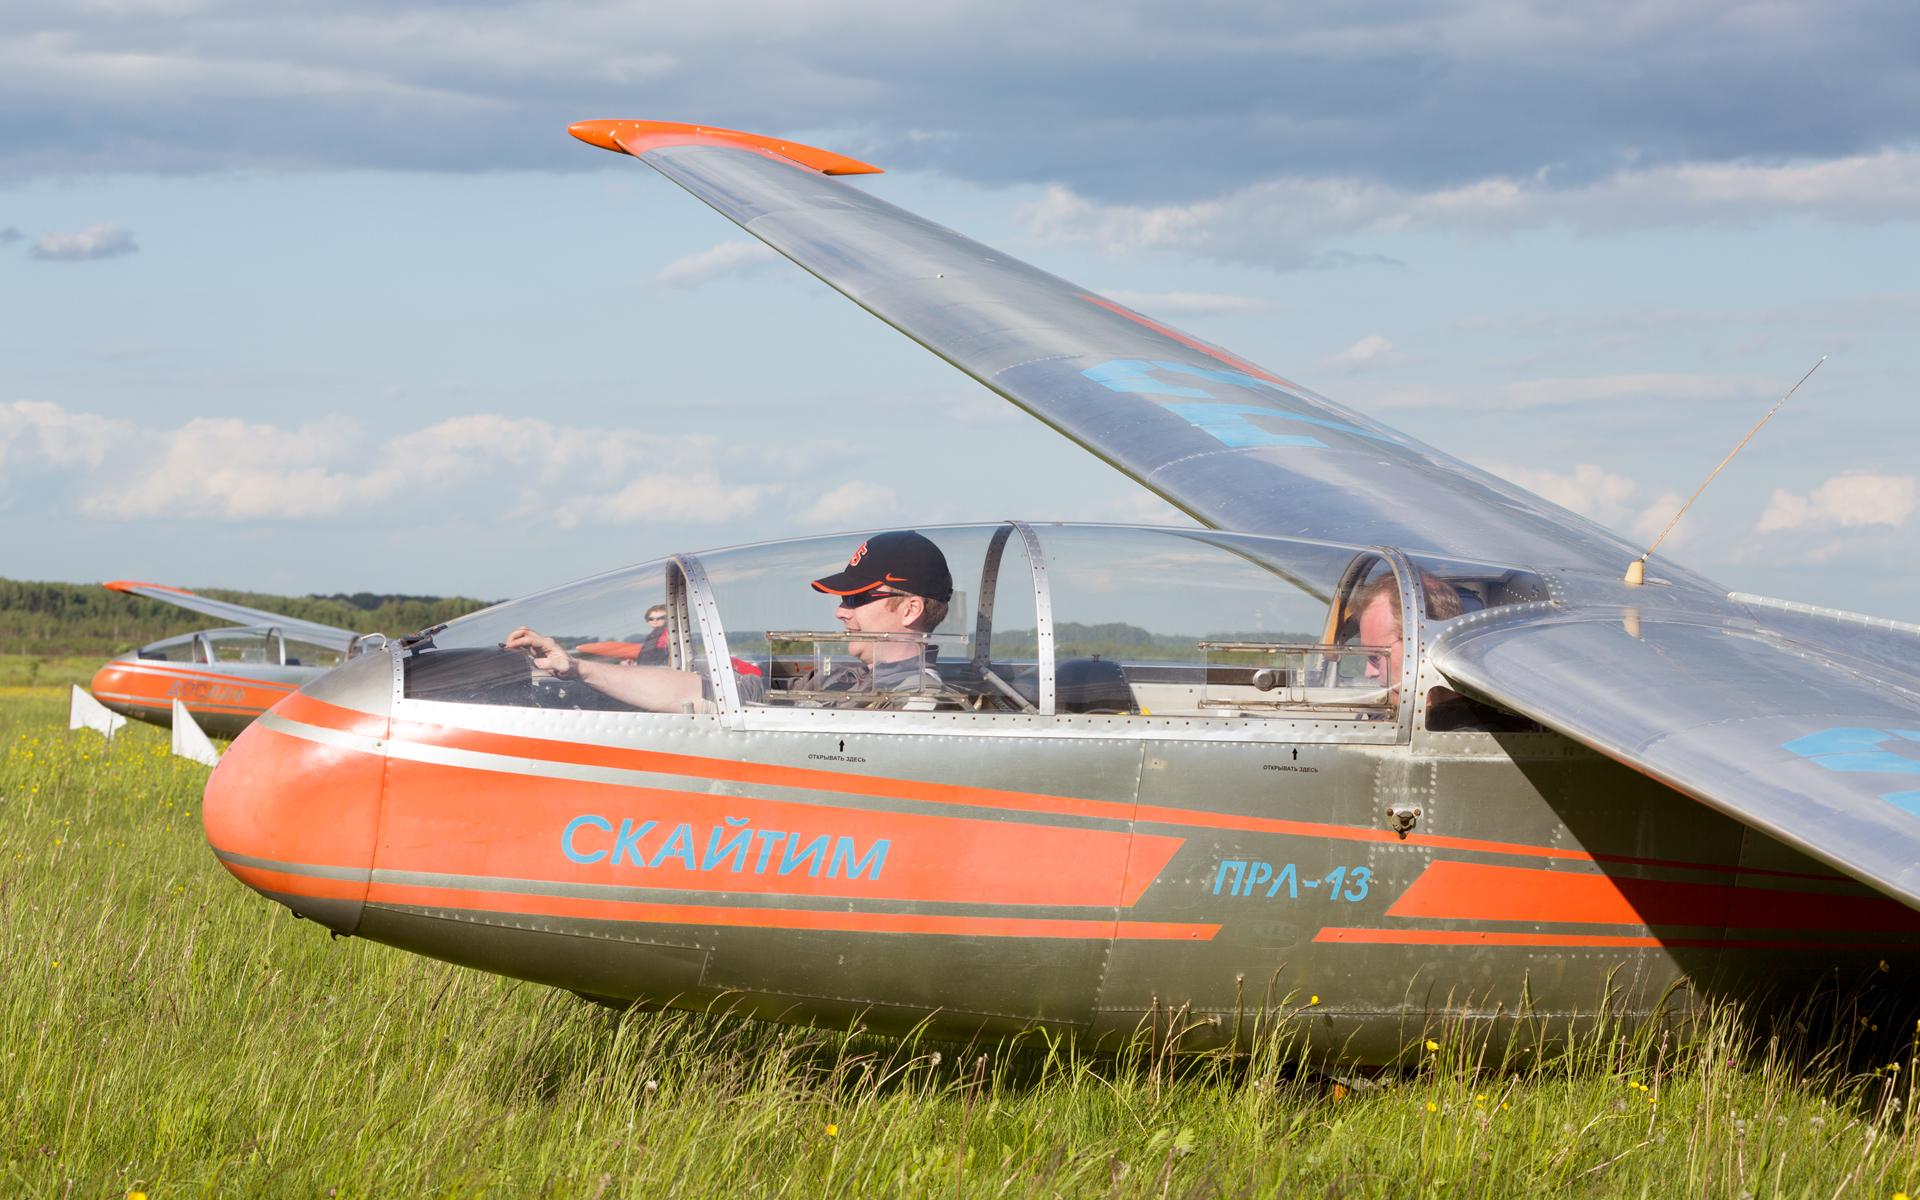 Wallpaper Boat Vehicle Airplane Aircraft Pilot Glider